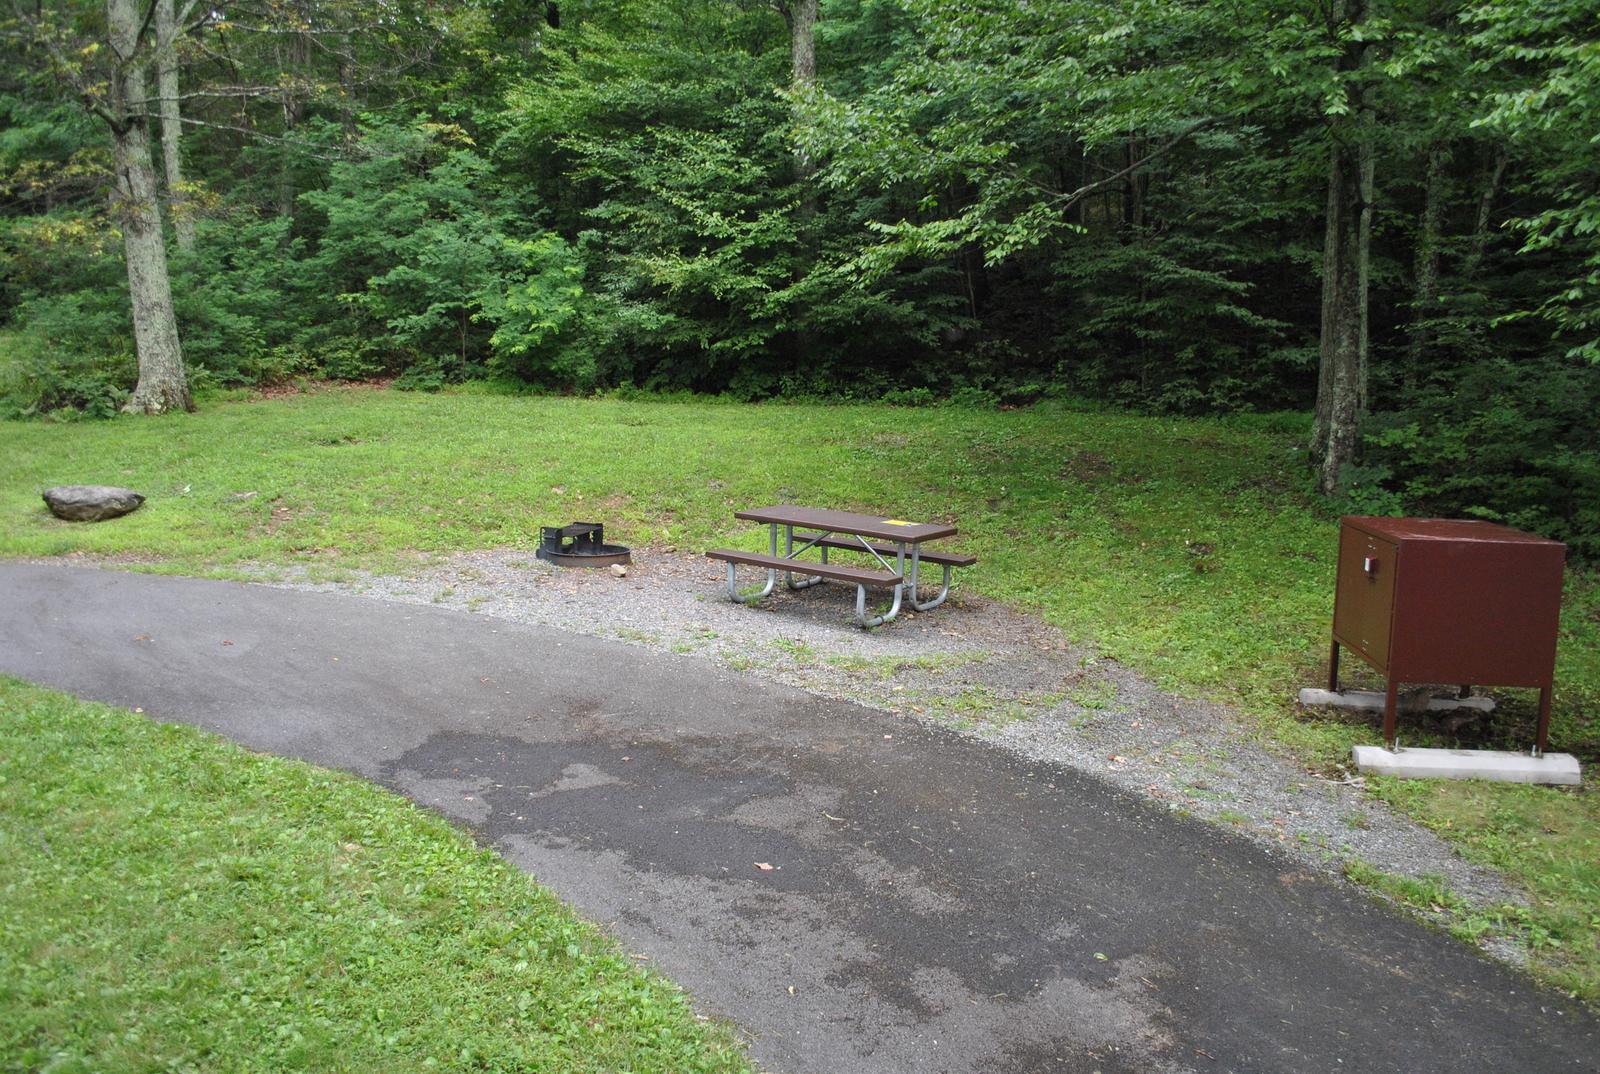 Mathews Arm Campground – Site A035